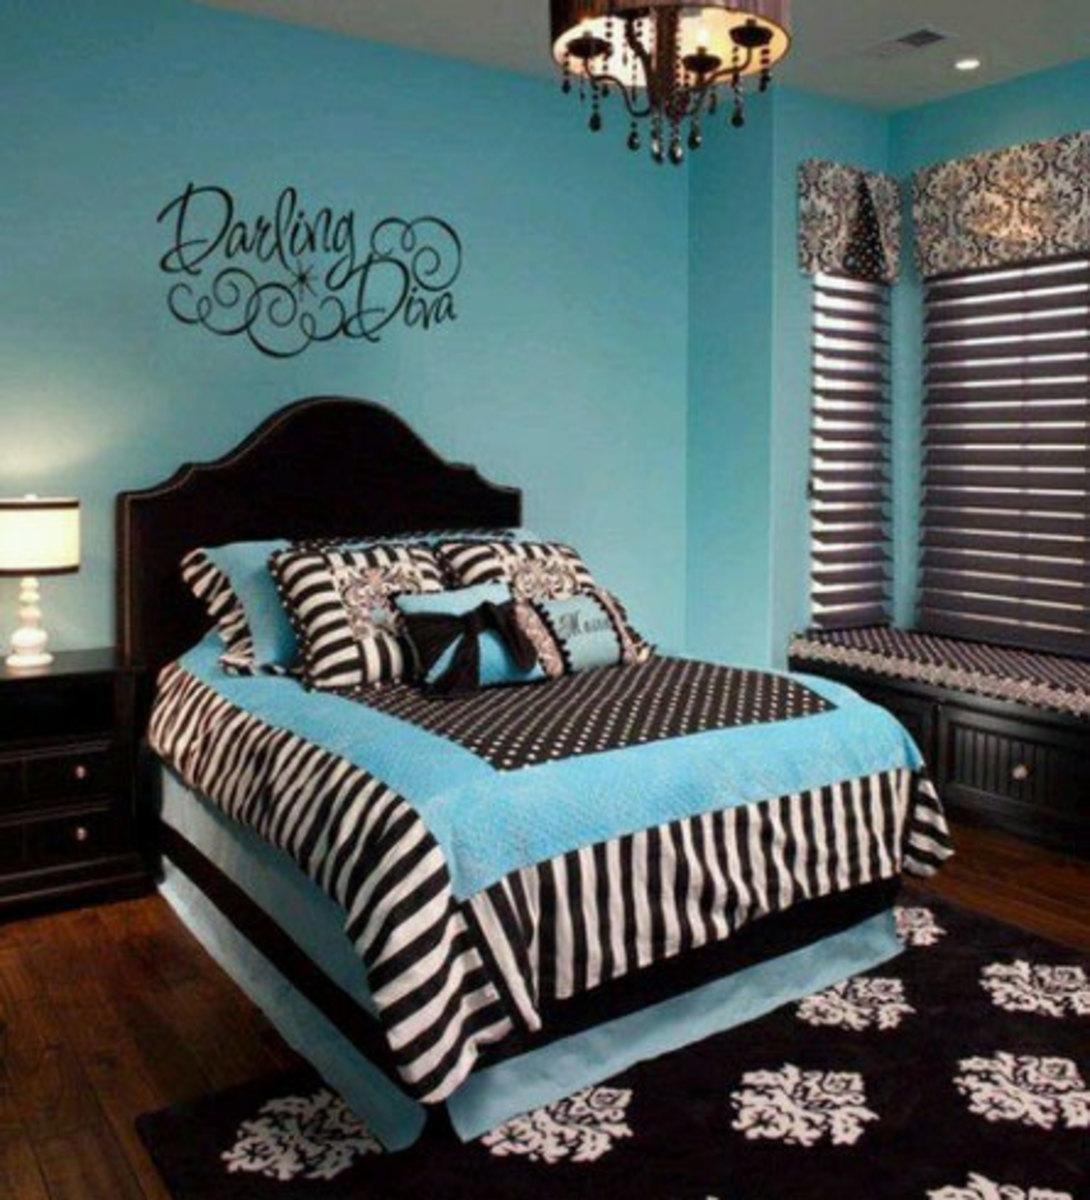 Girly Bedroom Diy Adult Cozy: 20 Teenage Girl Bedroom Decorating Ideas